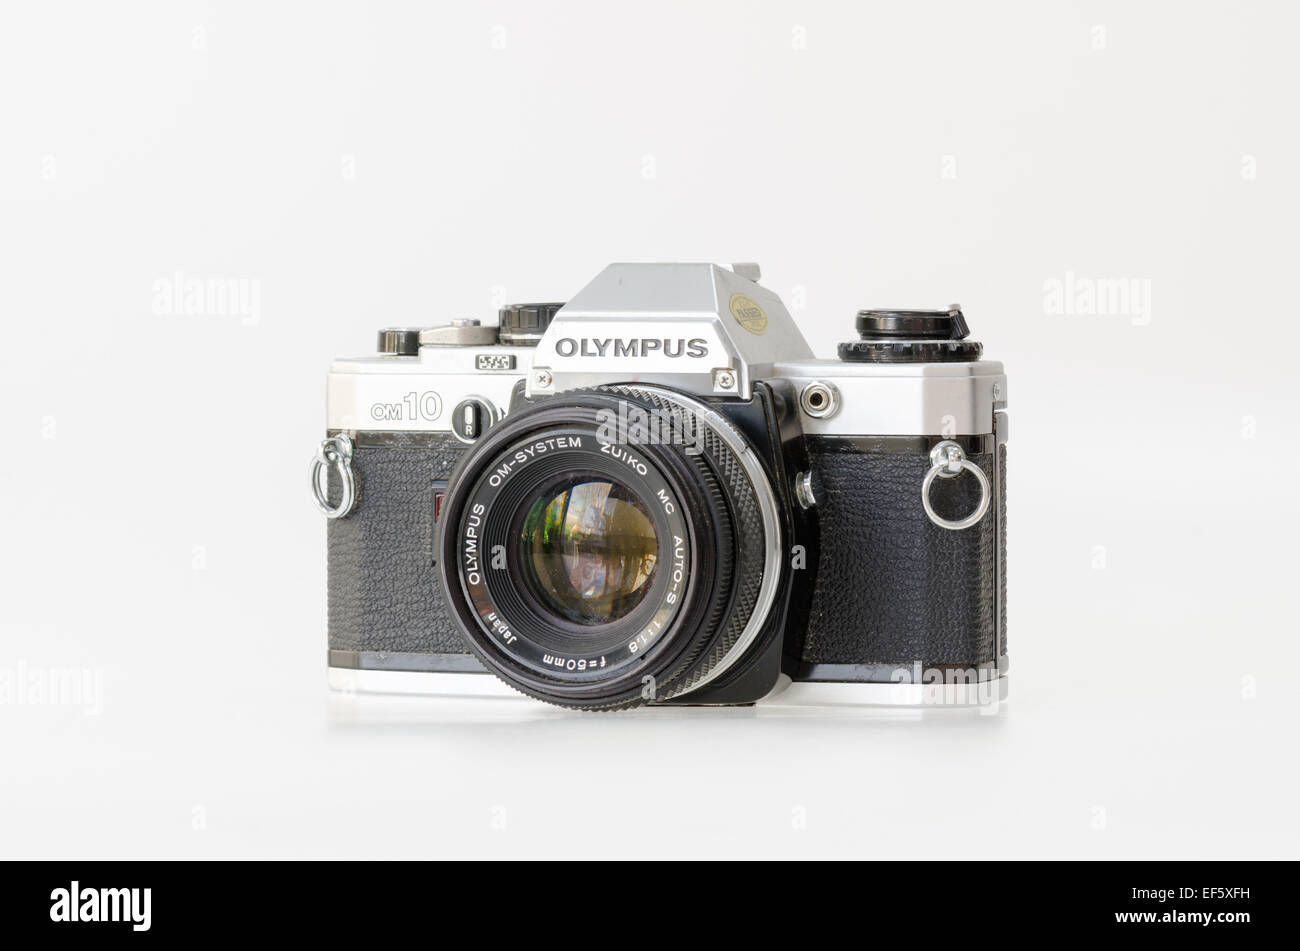 Silver Olympus OM10 35mm film slr camera - Stock Image